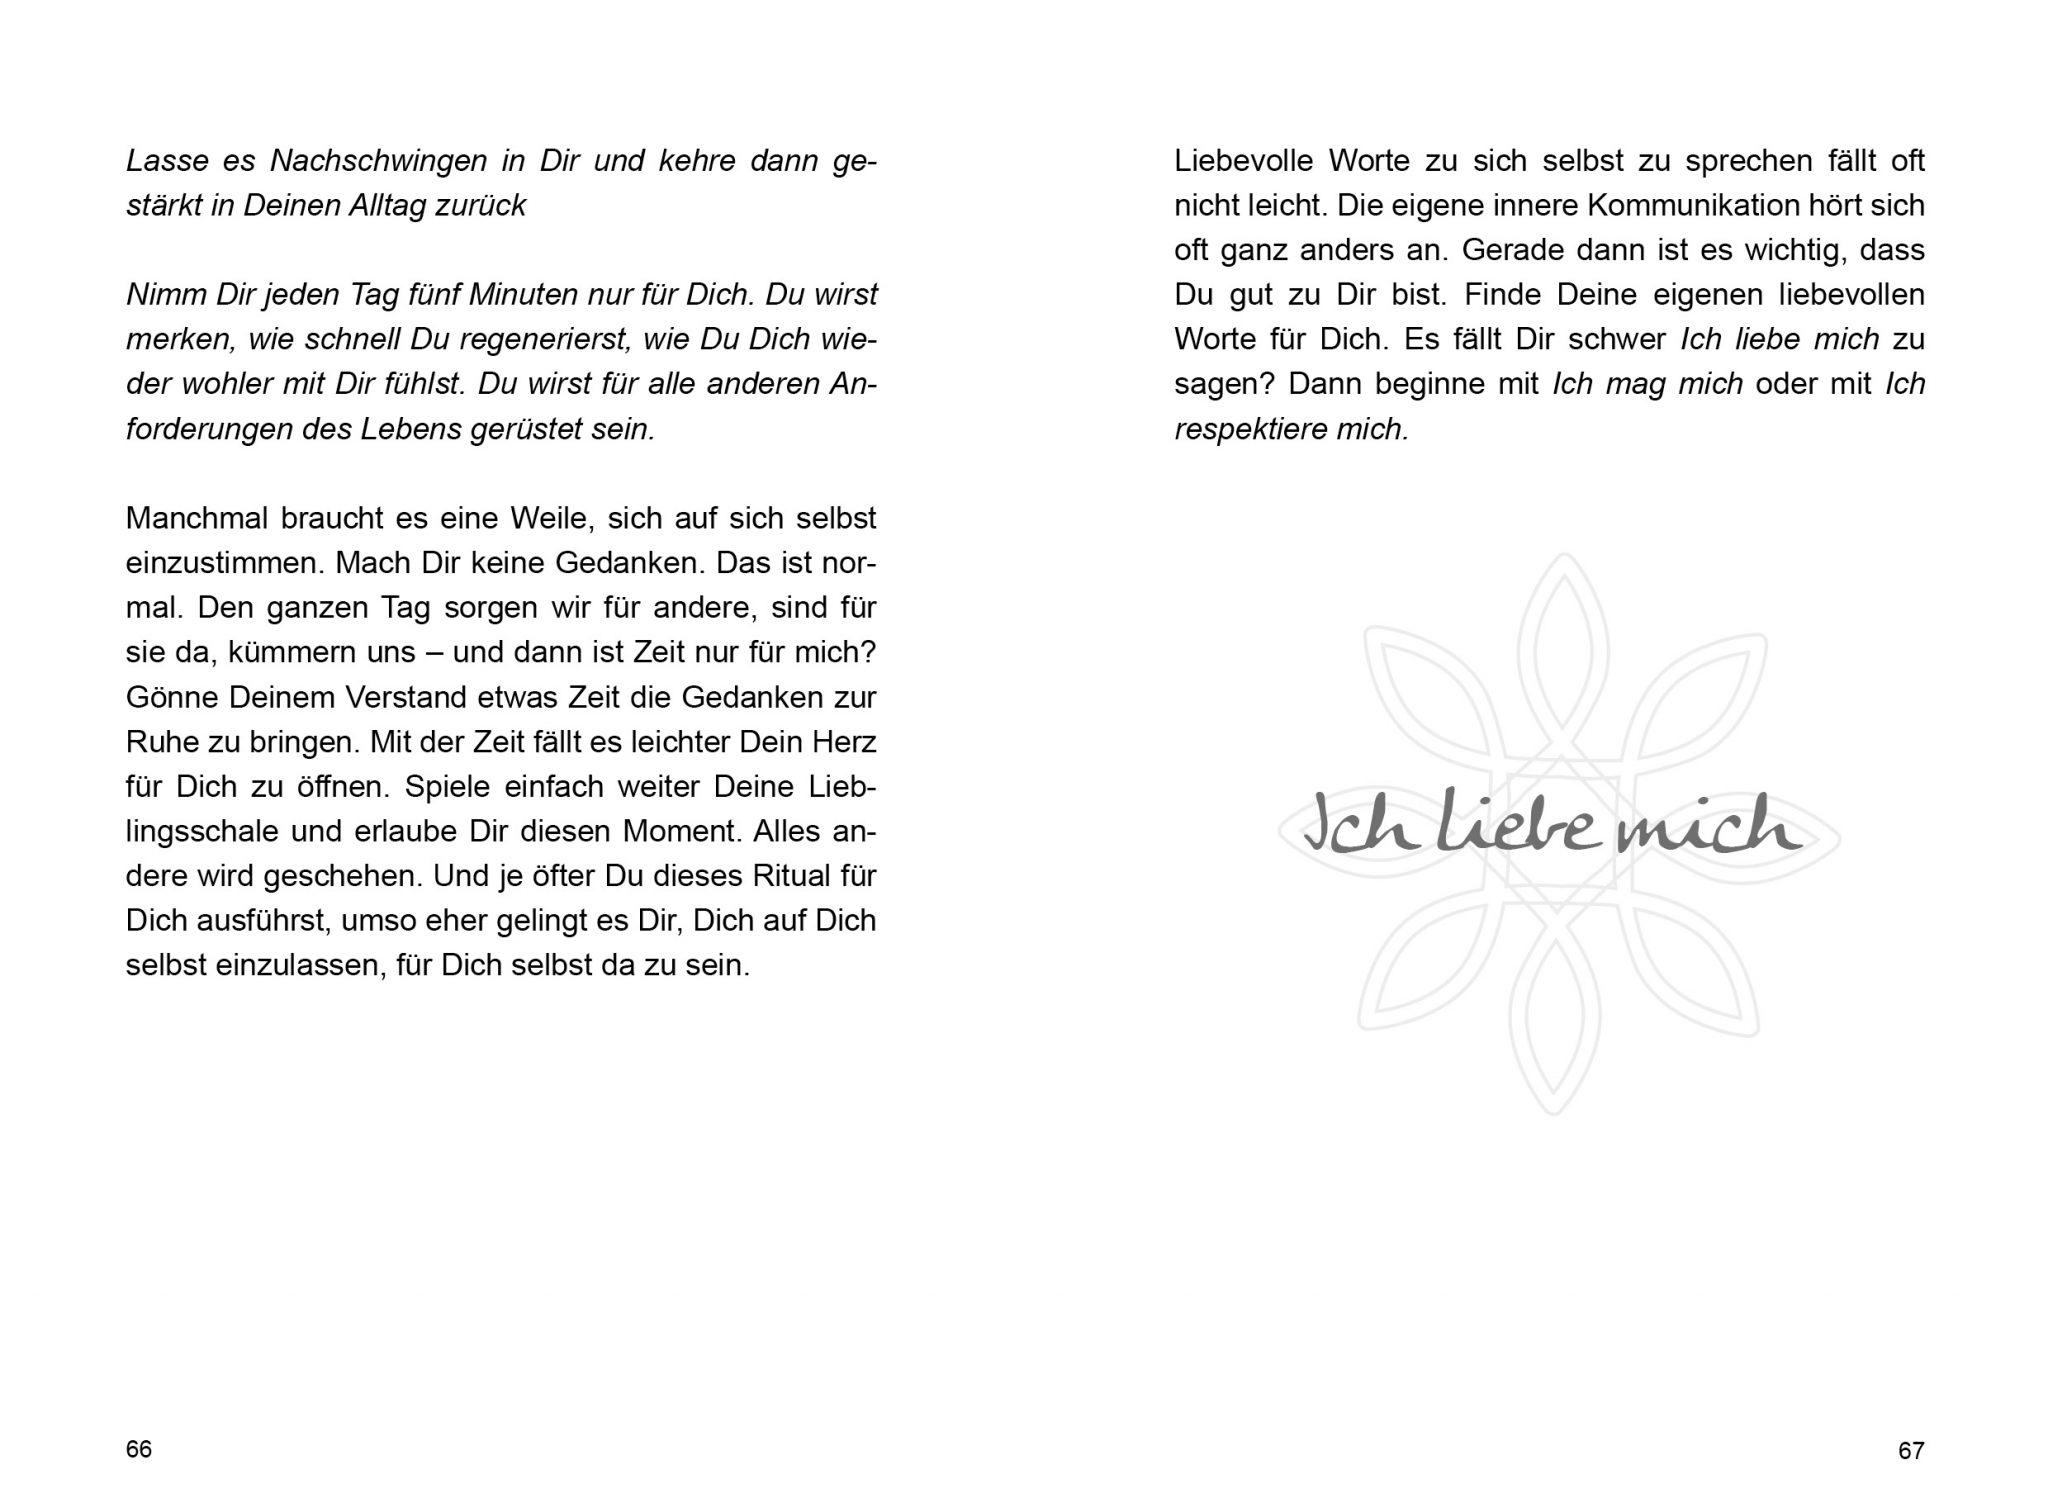 09_Seelenmomente_Seiten_66_67_DS